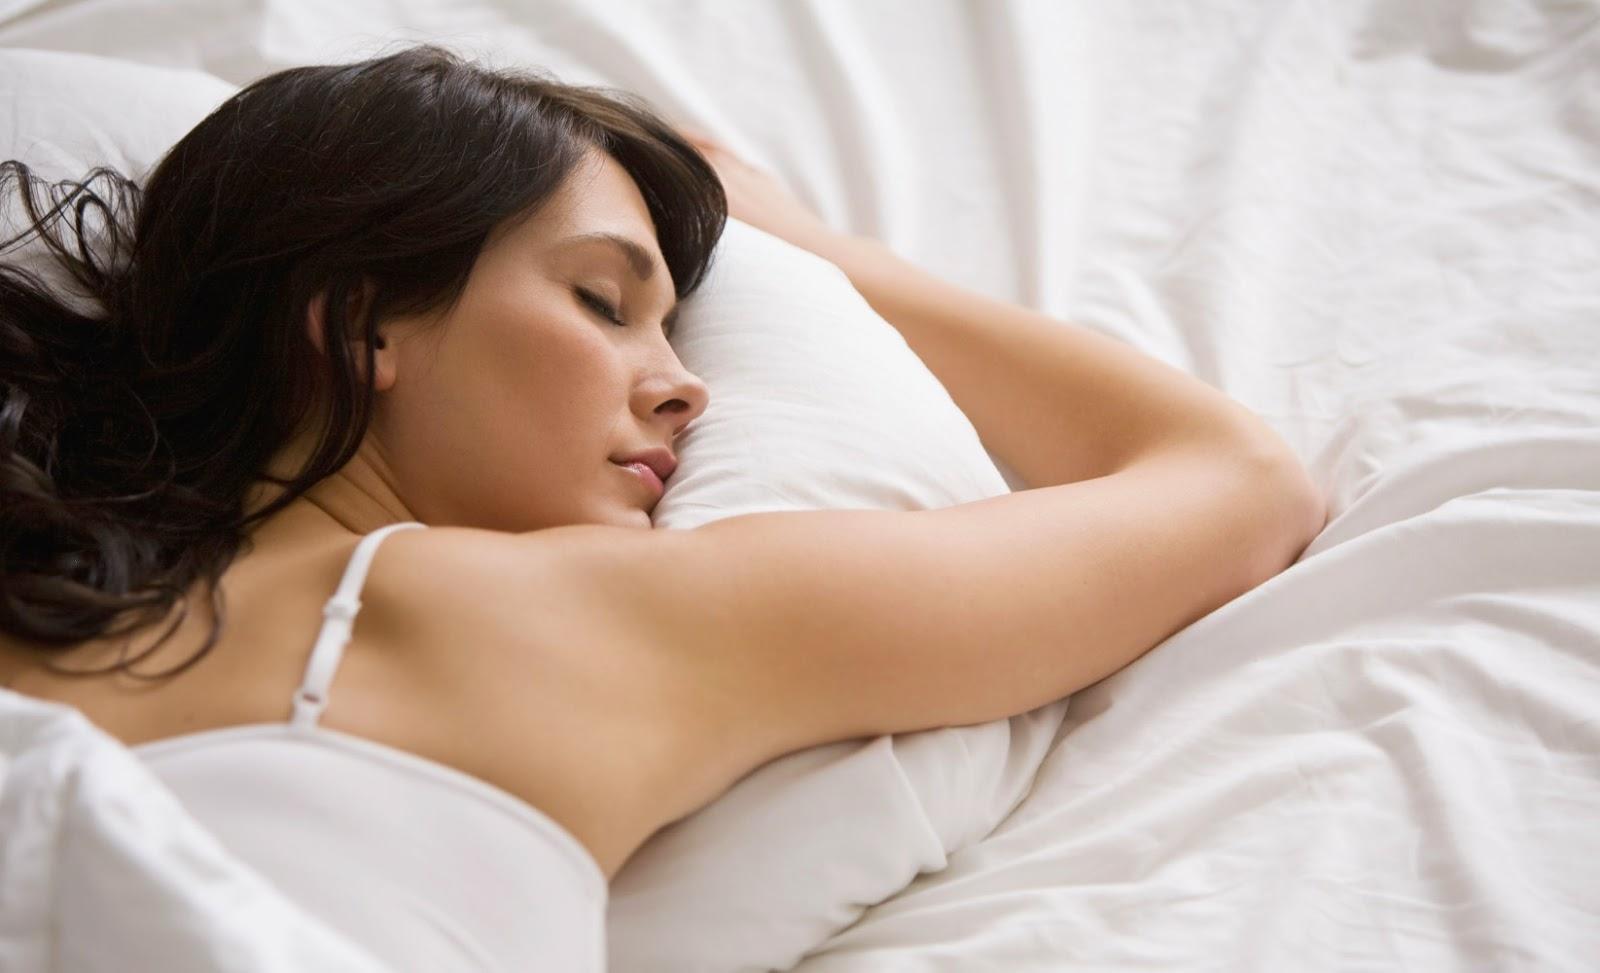 Dampak Bahaya Tidur Dengan Lampu Menyala